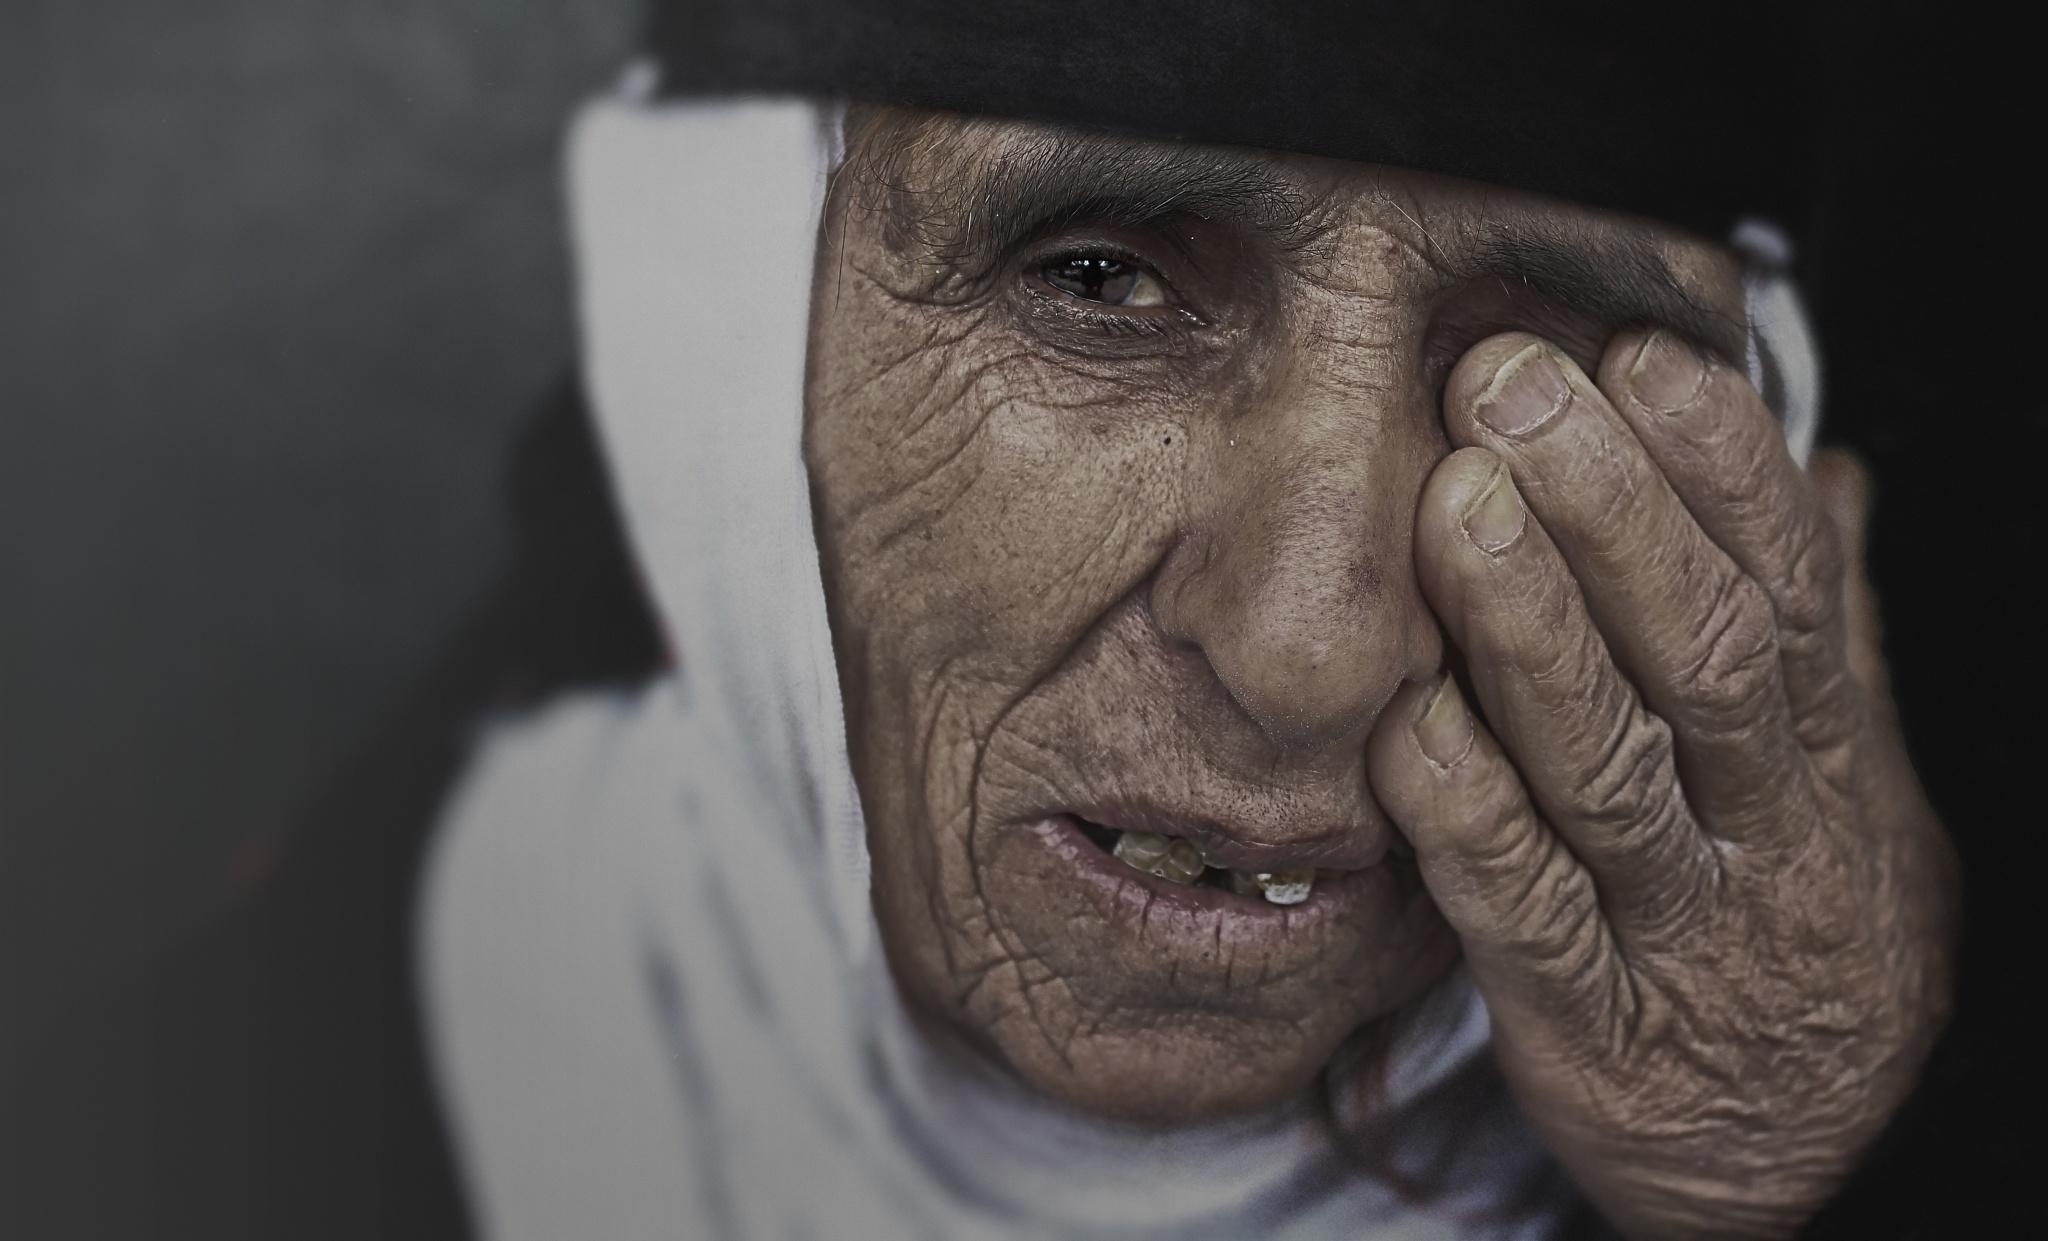 #portrait  #streetphotography #blackandwhite #kurdish #iraqi by Azad Zebaree